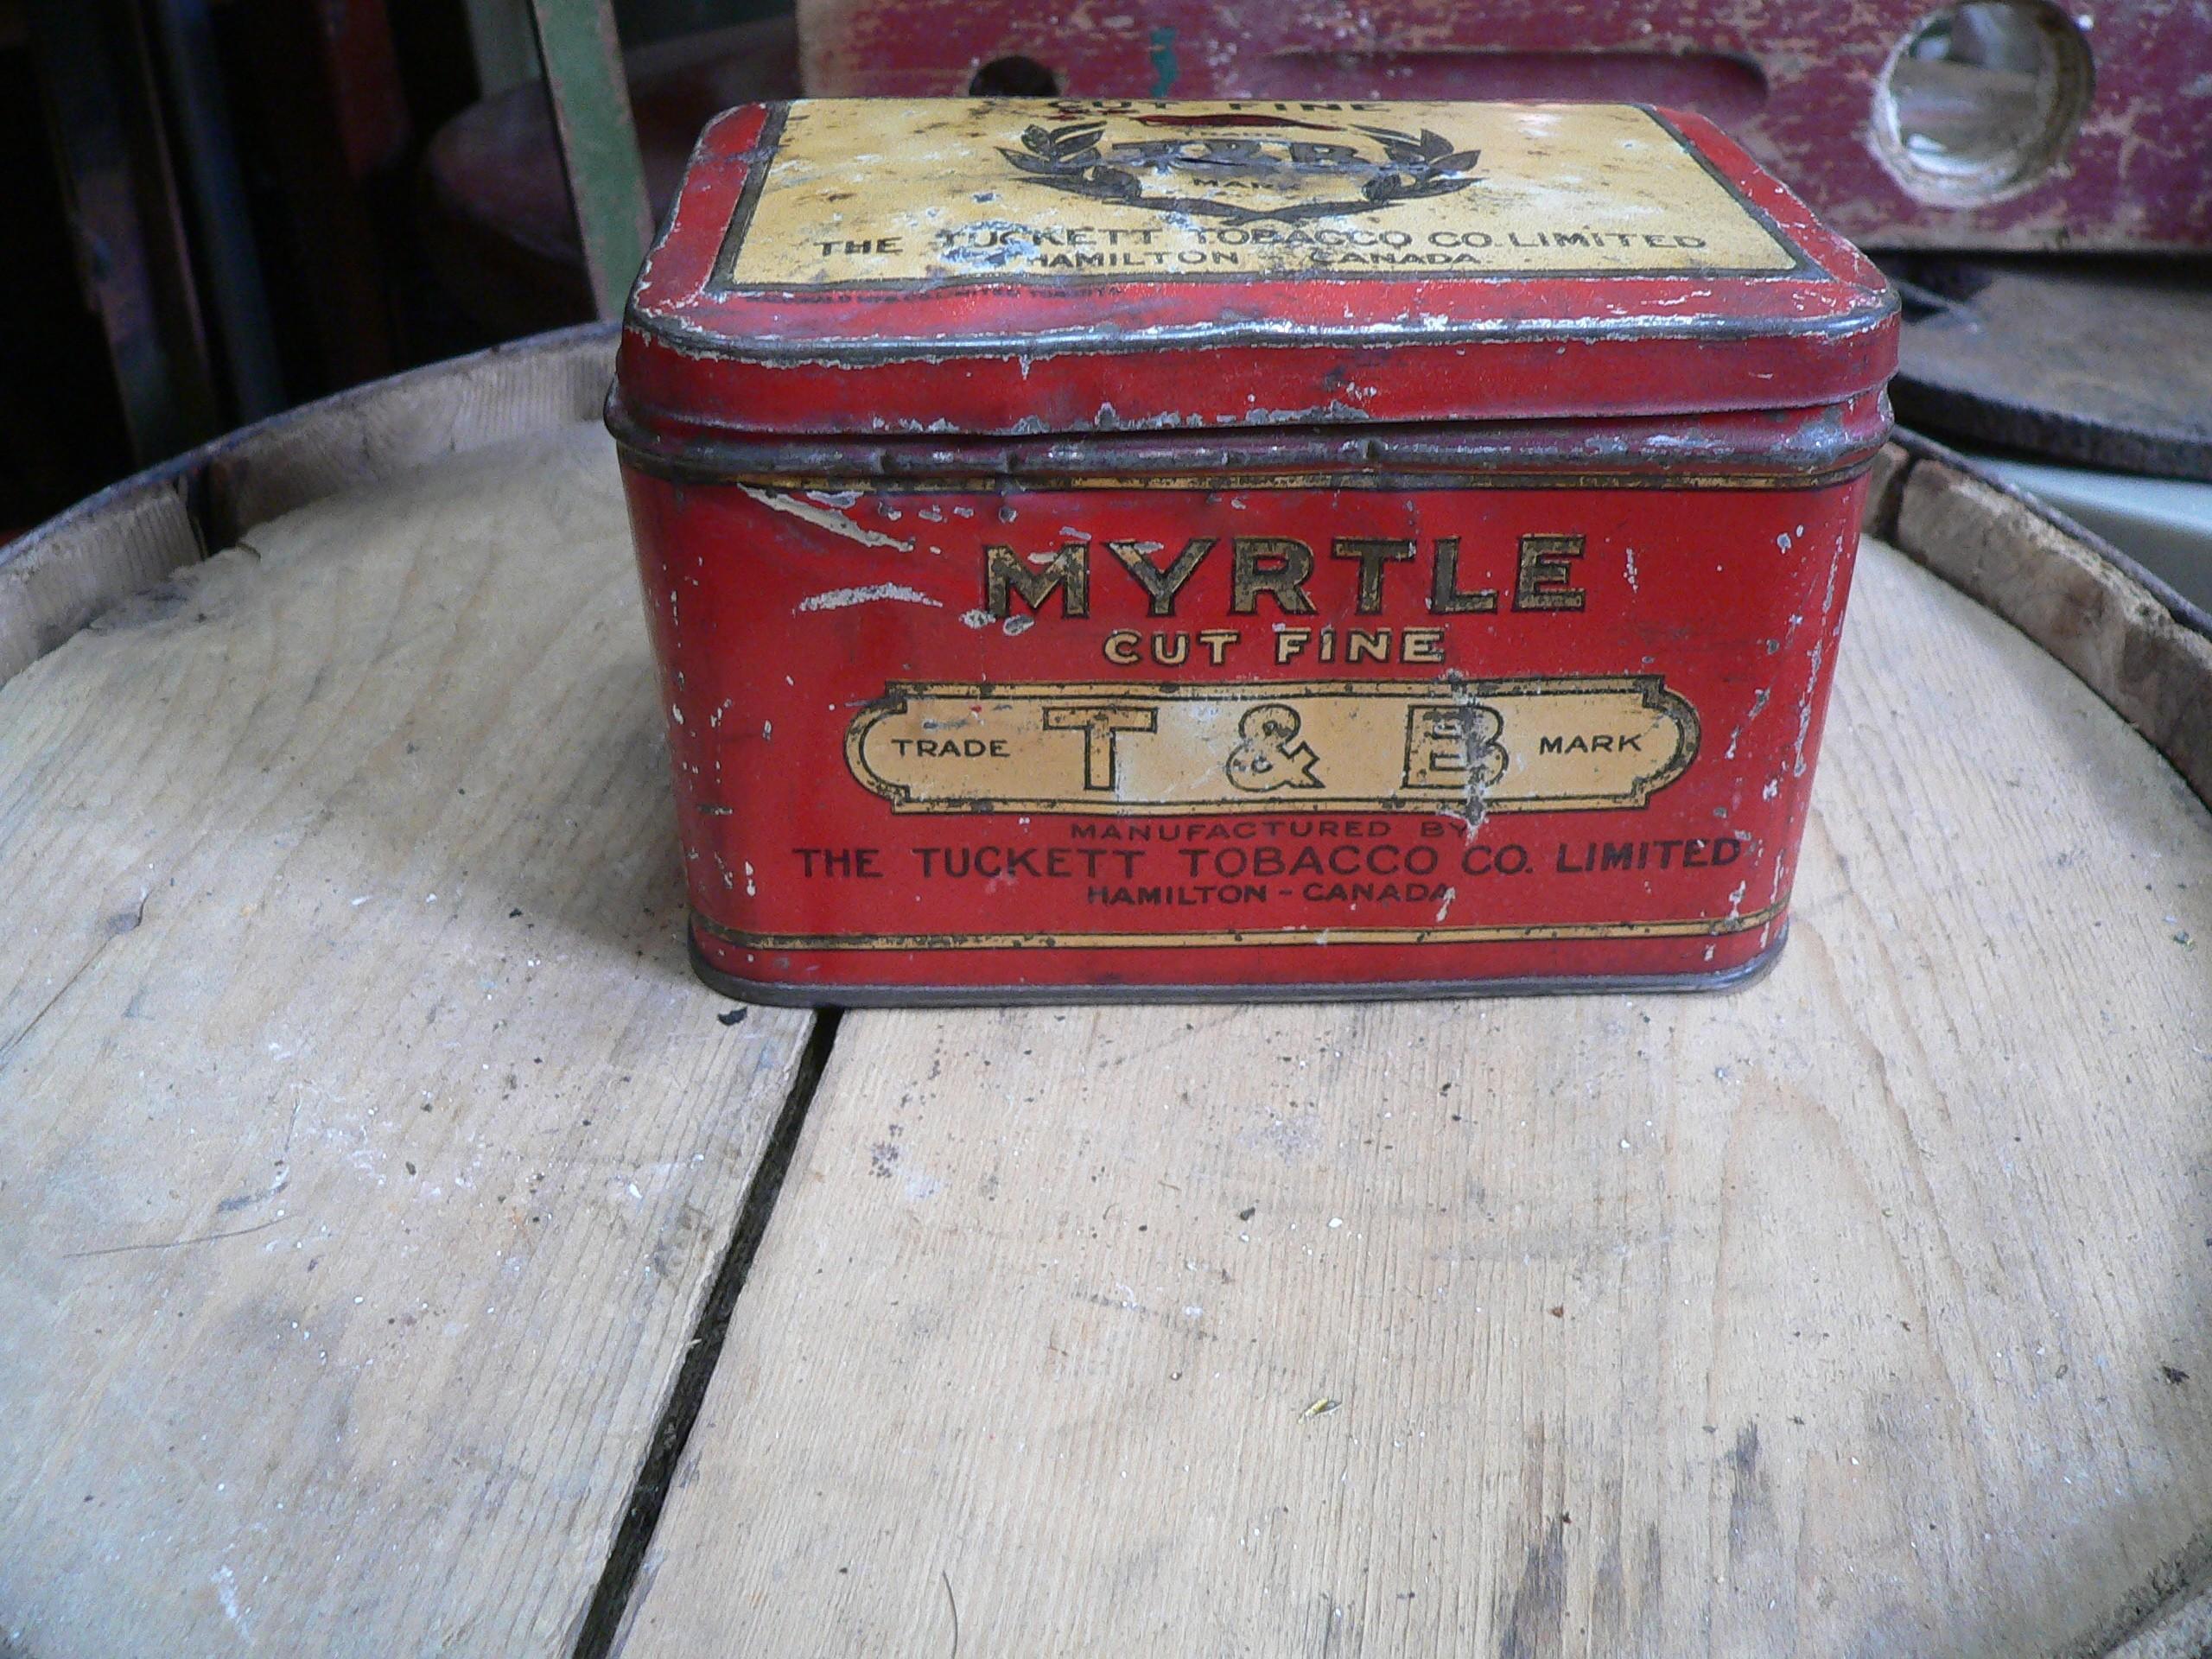 Canne de tabac myrtle cut # 7311.16